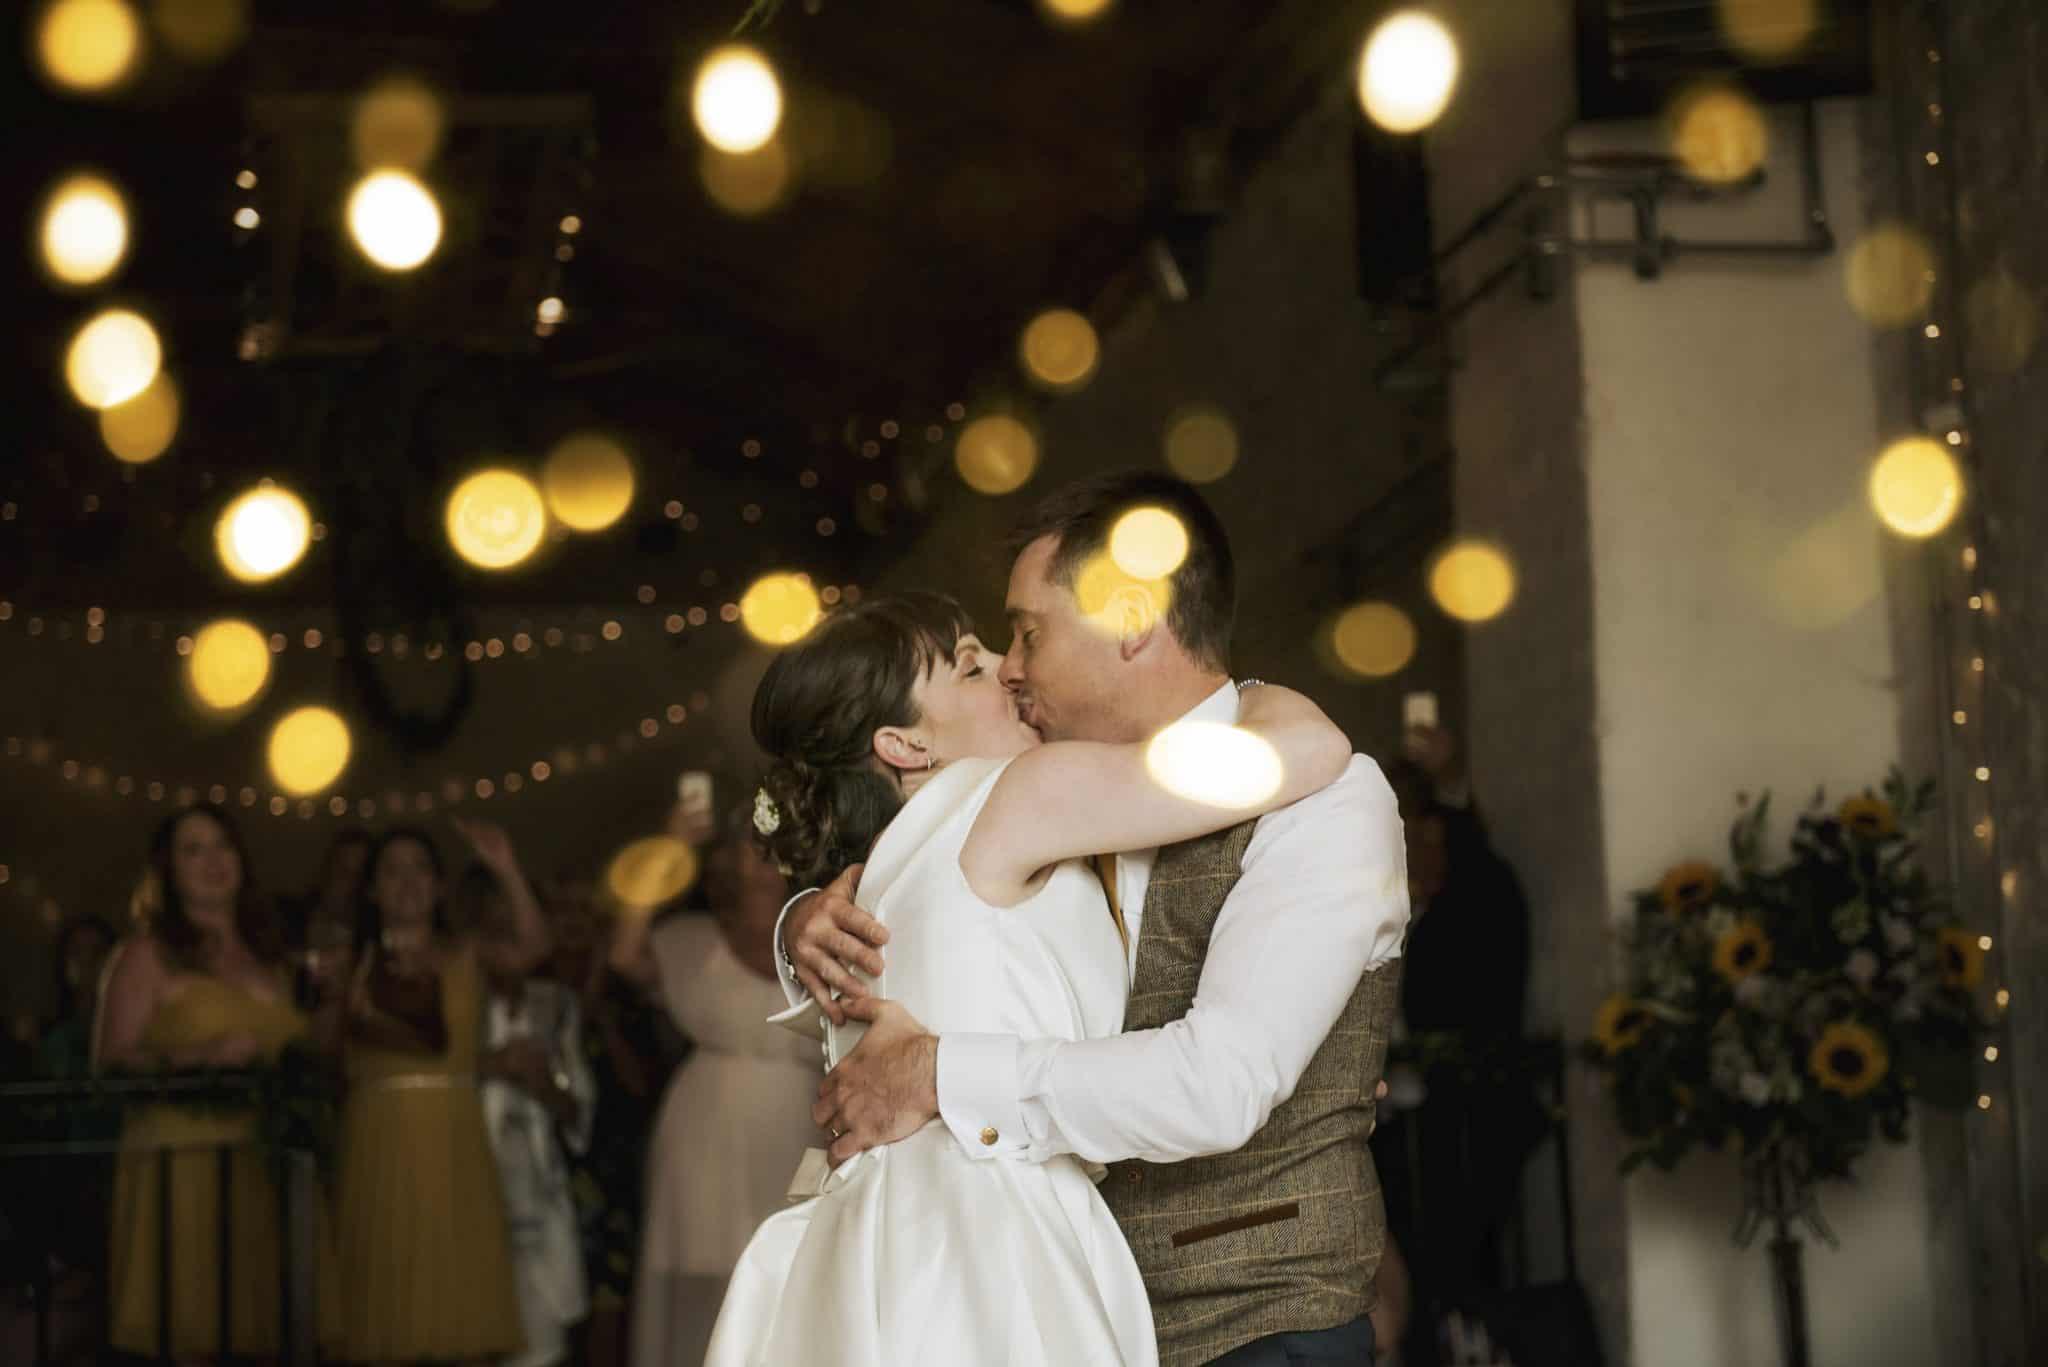 Bride & Groom hug and kiss on dance floor